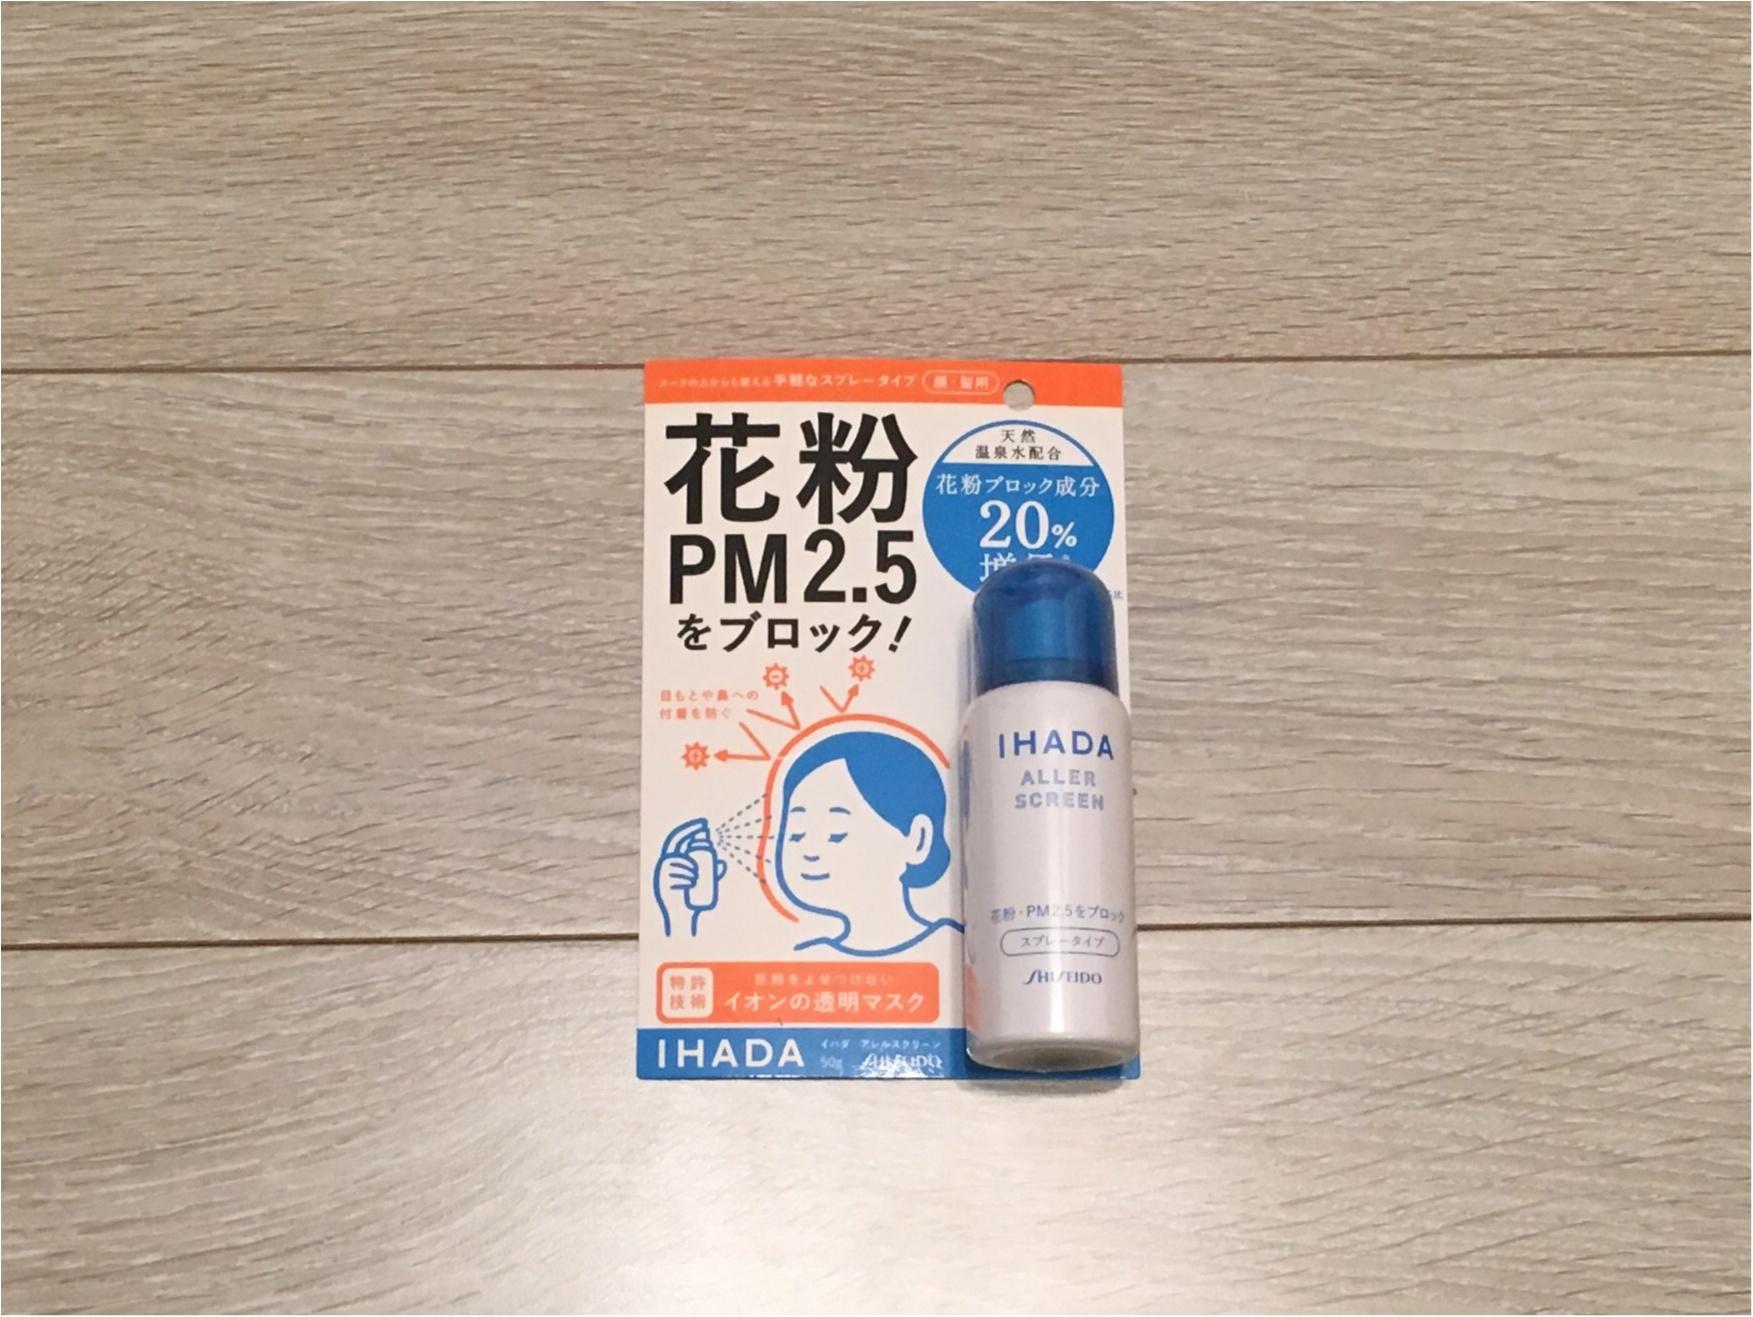 【IHADA】花粉症、PM2.5に効果的アイテム!定番スプレータイプ&持ち歩きにも便利なジェルタイプ!_2